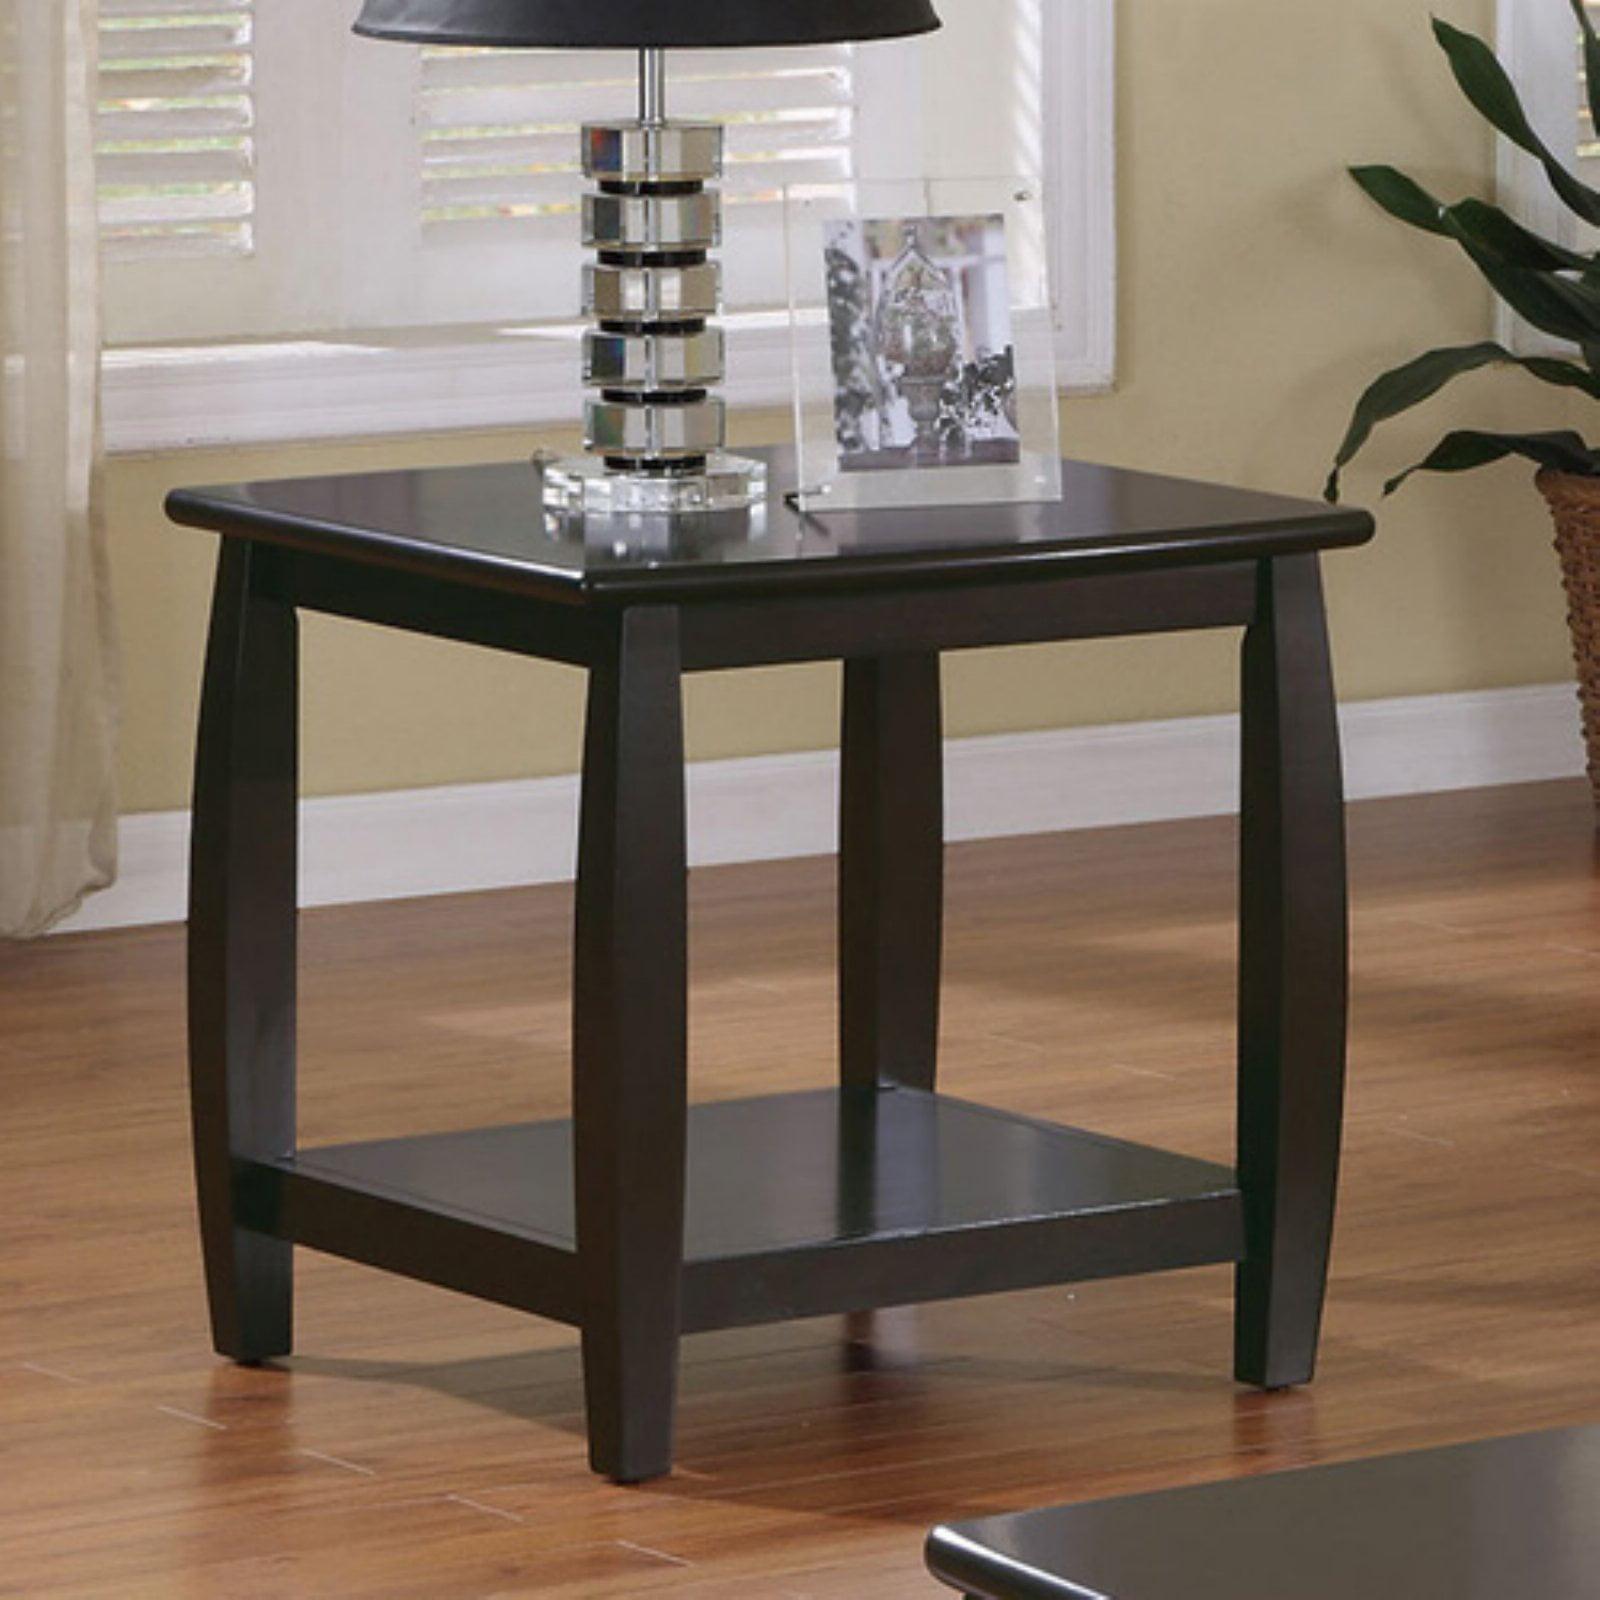 Coaster Company Double Shelf End Table, Cappuccino